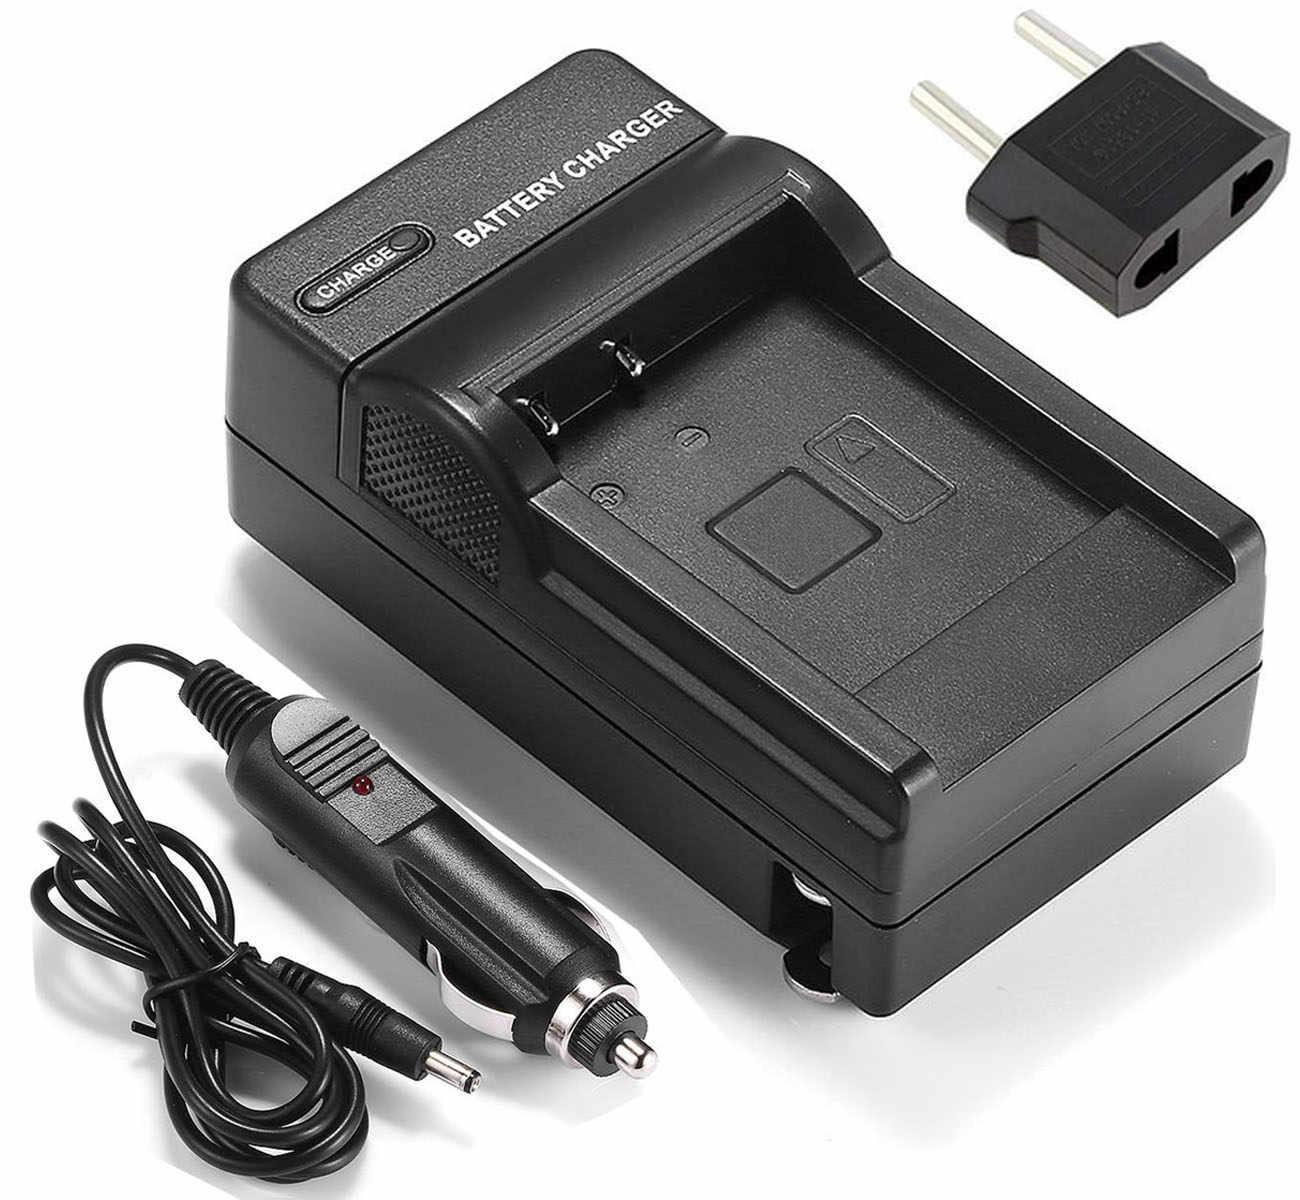 Battery Charger For Fujifilm Finepix Jv100 Jv105 Jv150 Jv200 Jv205 Jv250 Jv255 Jv300 Jv500 Digital Camera Camera Charger Aliexpress